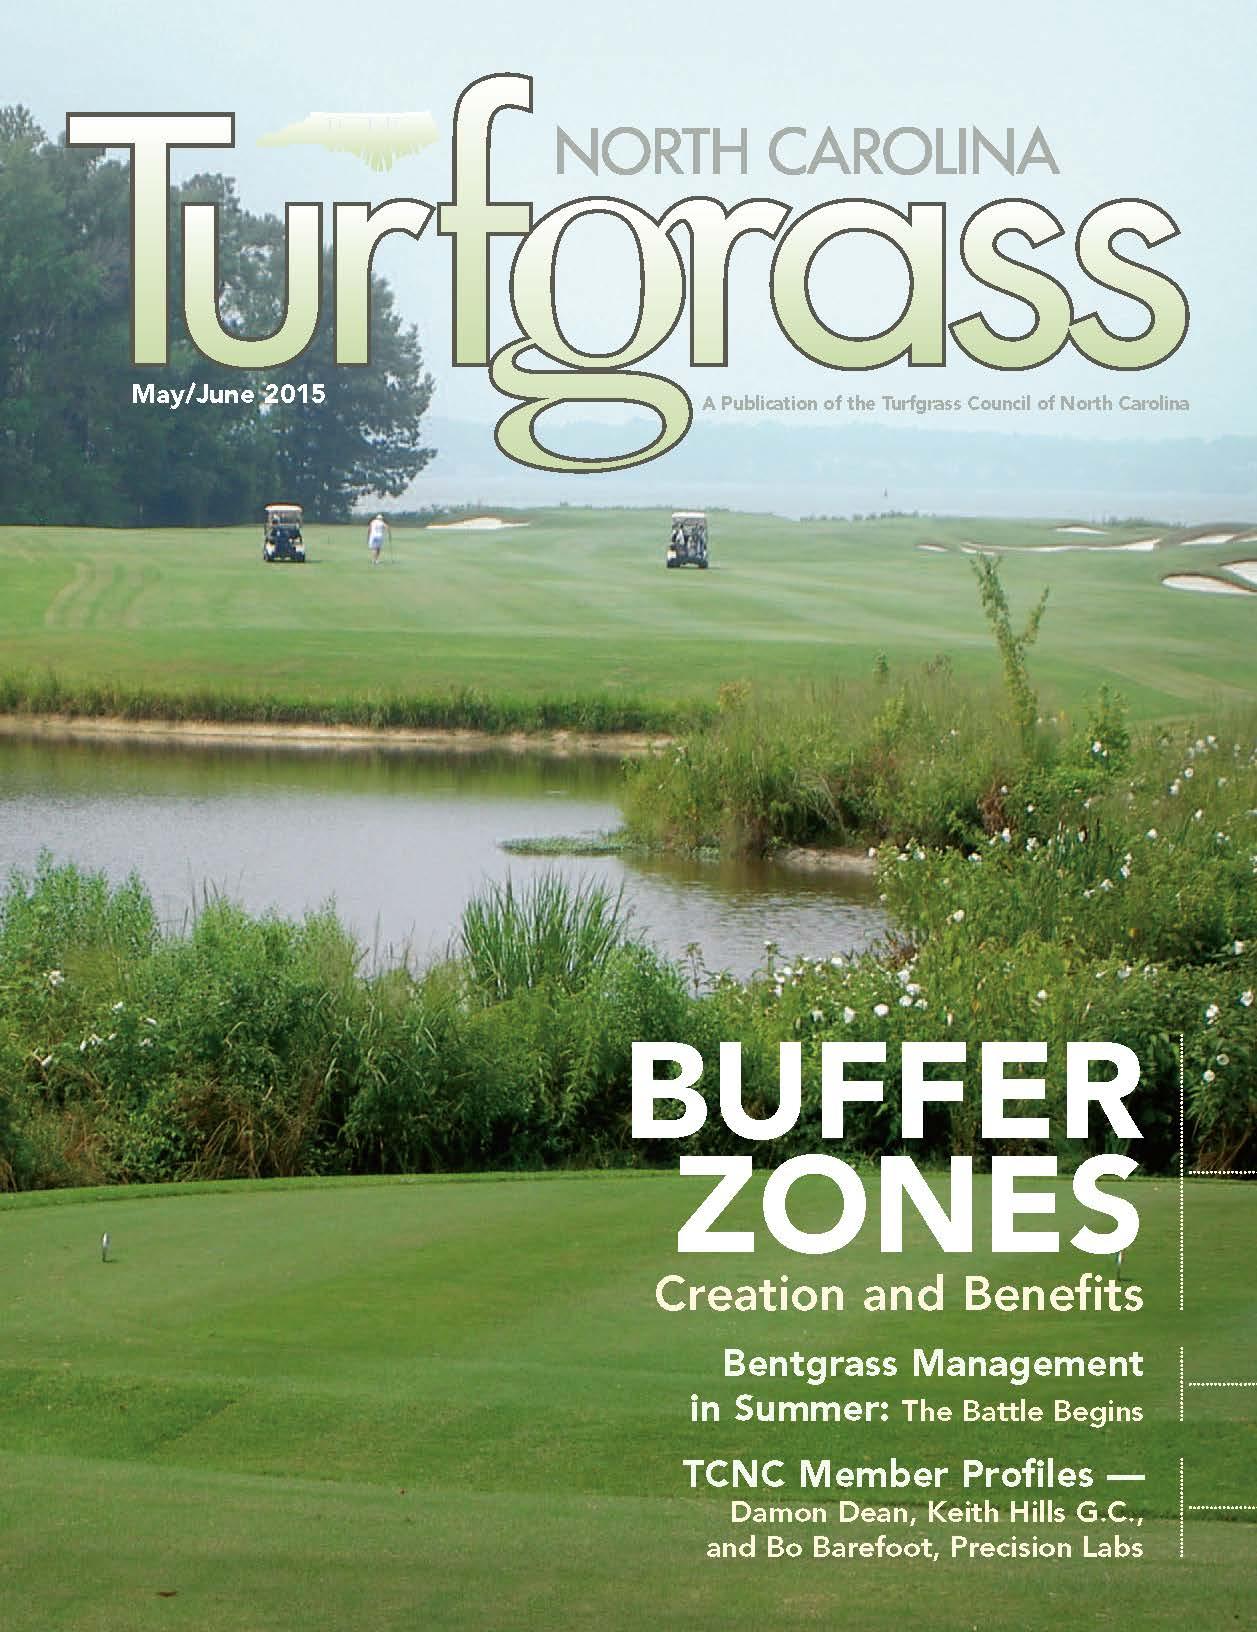 Pond Buffer Zones: Creation and Benefits_North Carolina Turfgrass Magazine